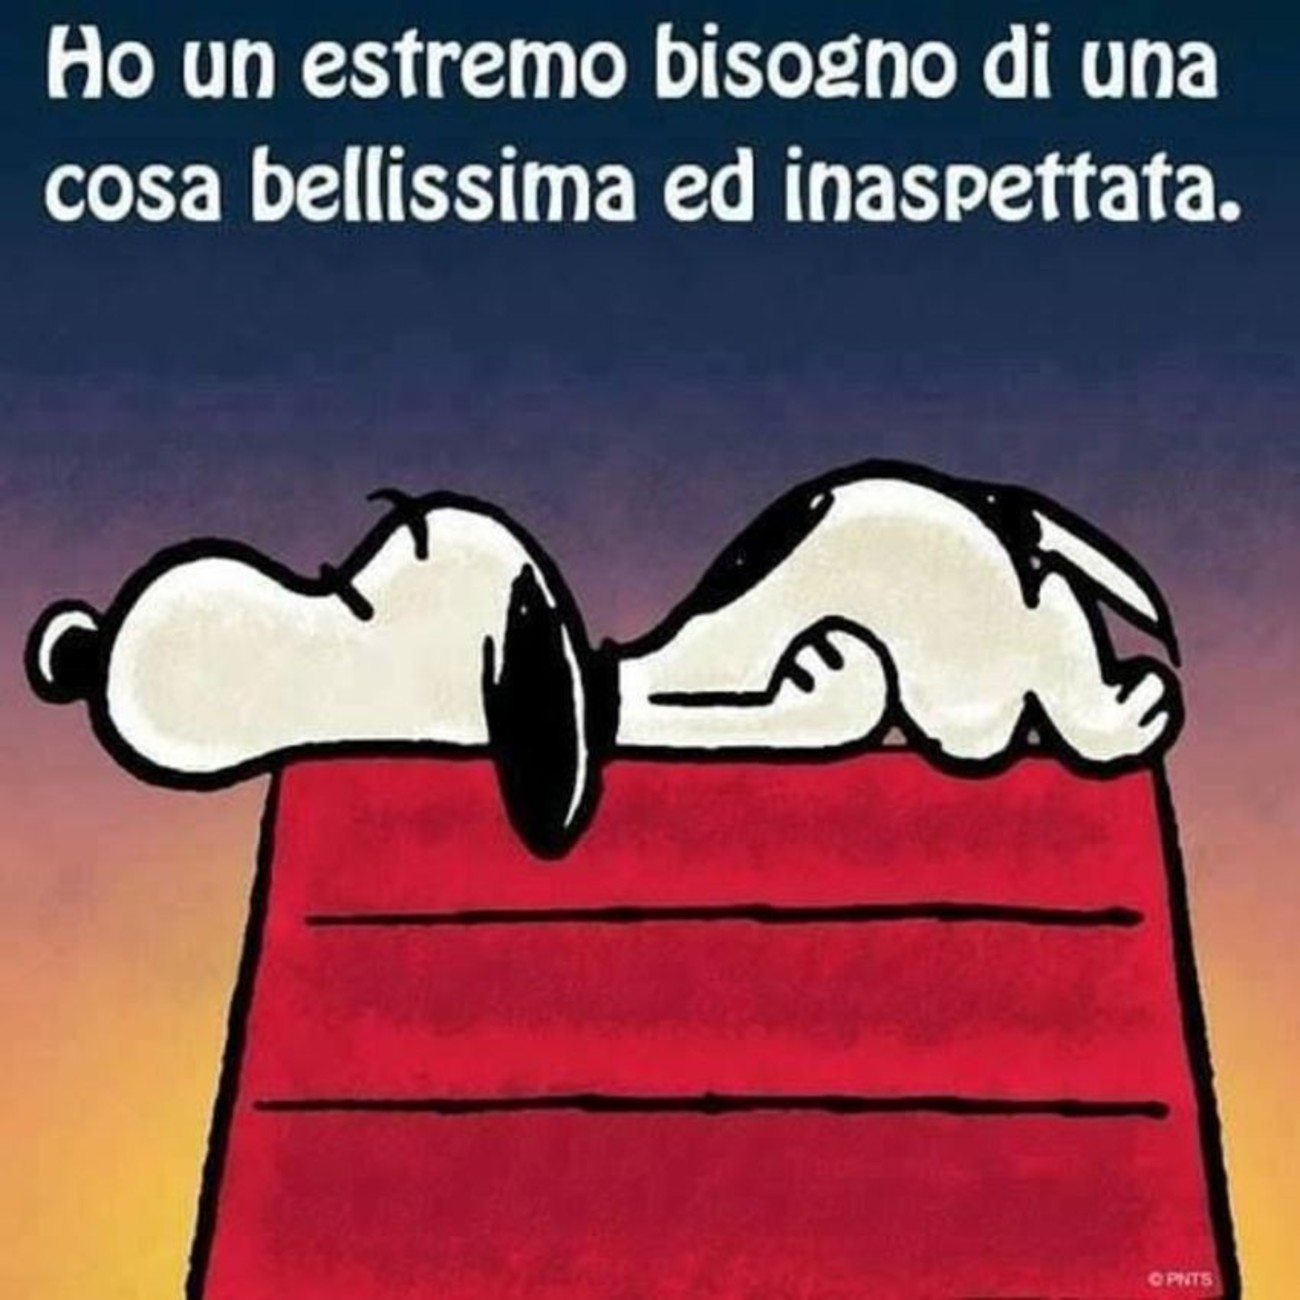 Snoopy vignette 6565